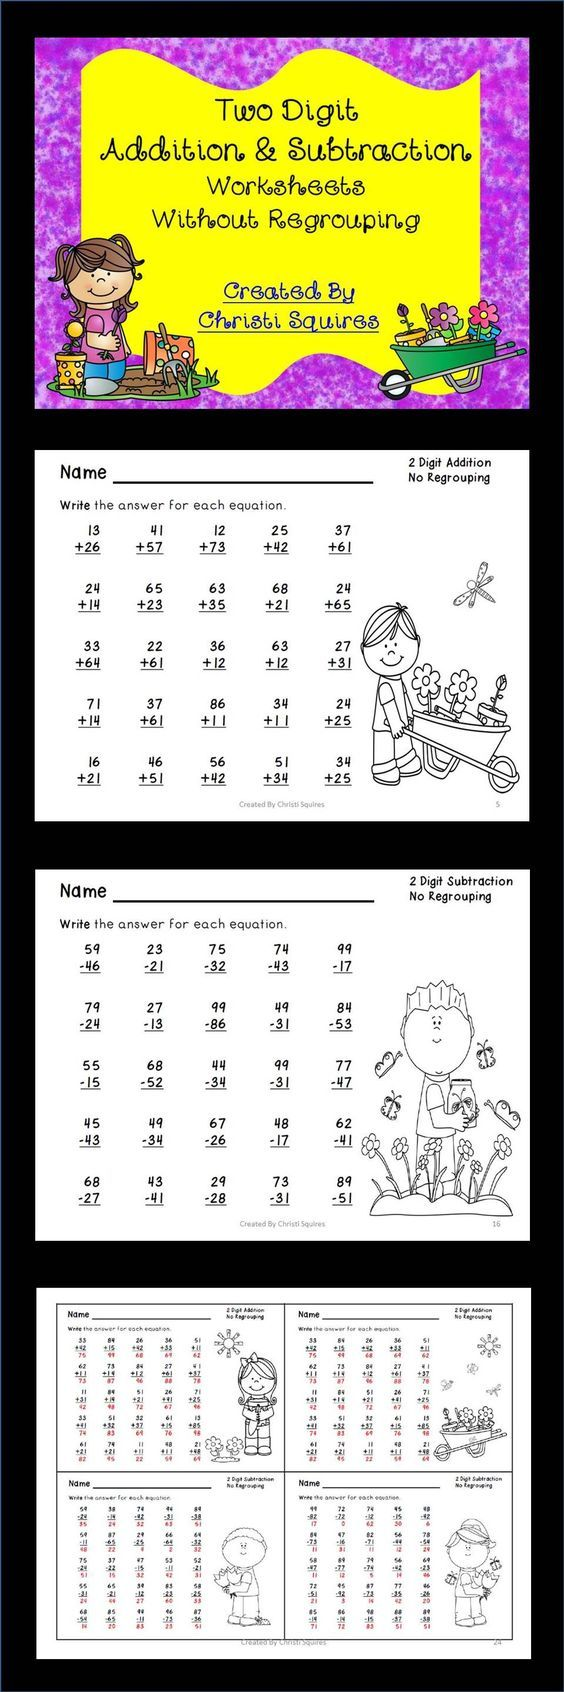 two digit addition subtraction worksheets without regrouping subtraction worksheets. Black Bedroom Furniture Sets. Home Design Ideas